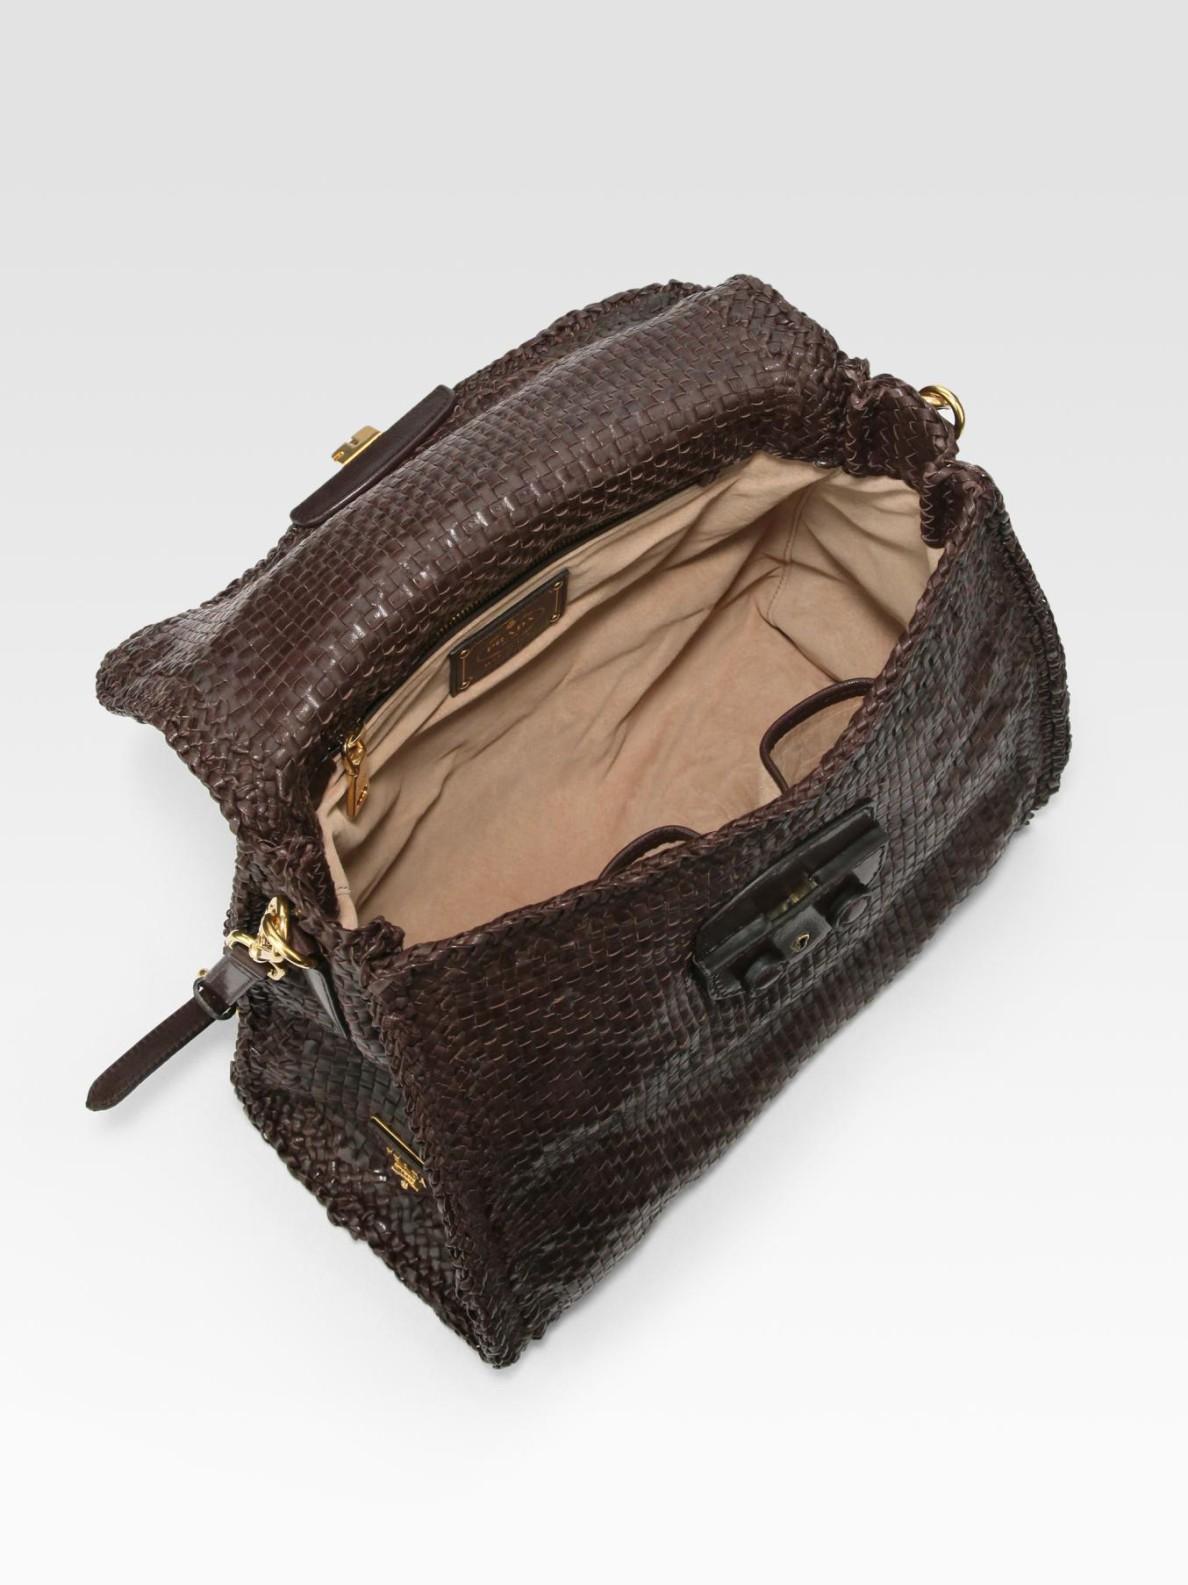 Prada Madras Top Handle Flap Tote Bag in Brown (darkbrown) | Lyst